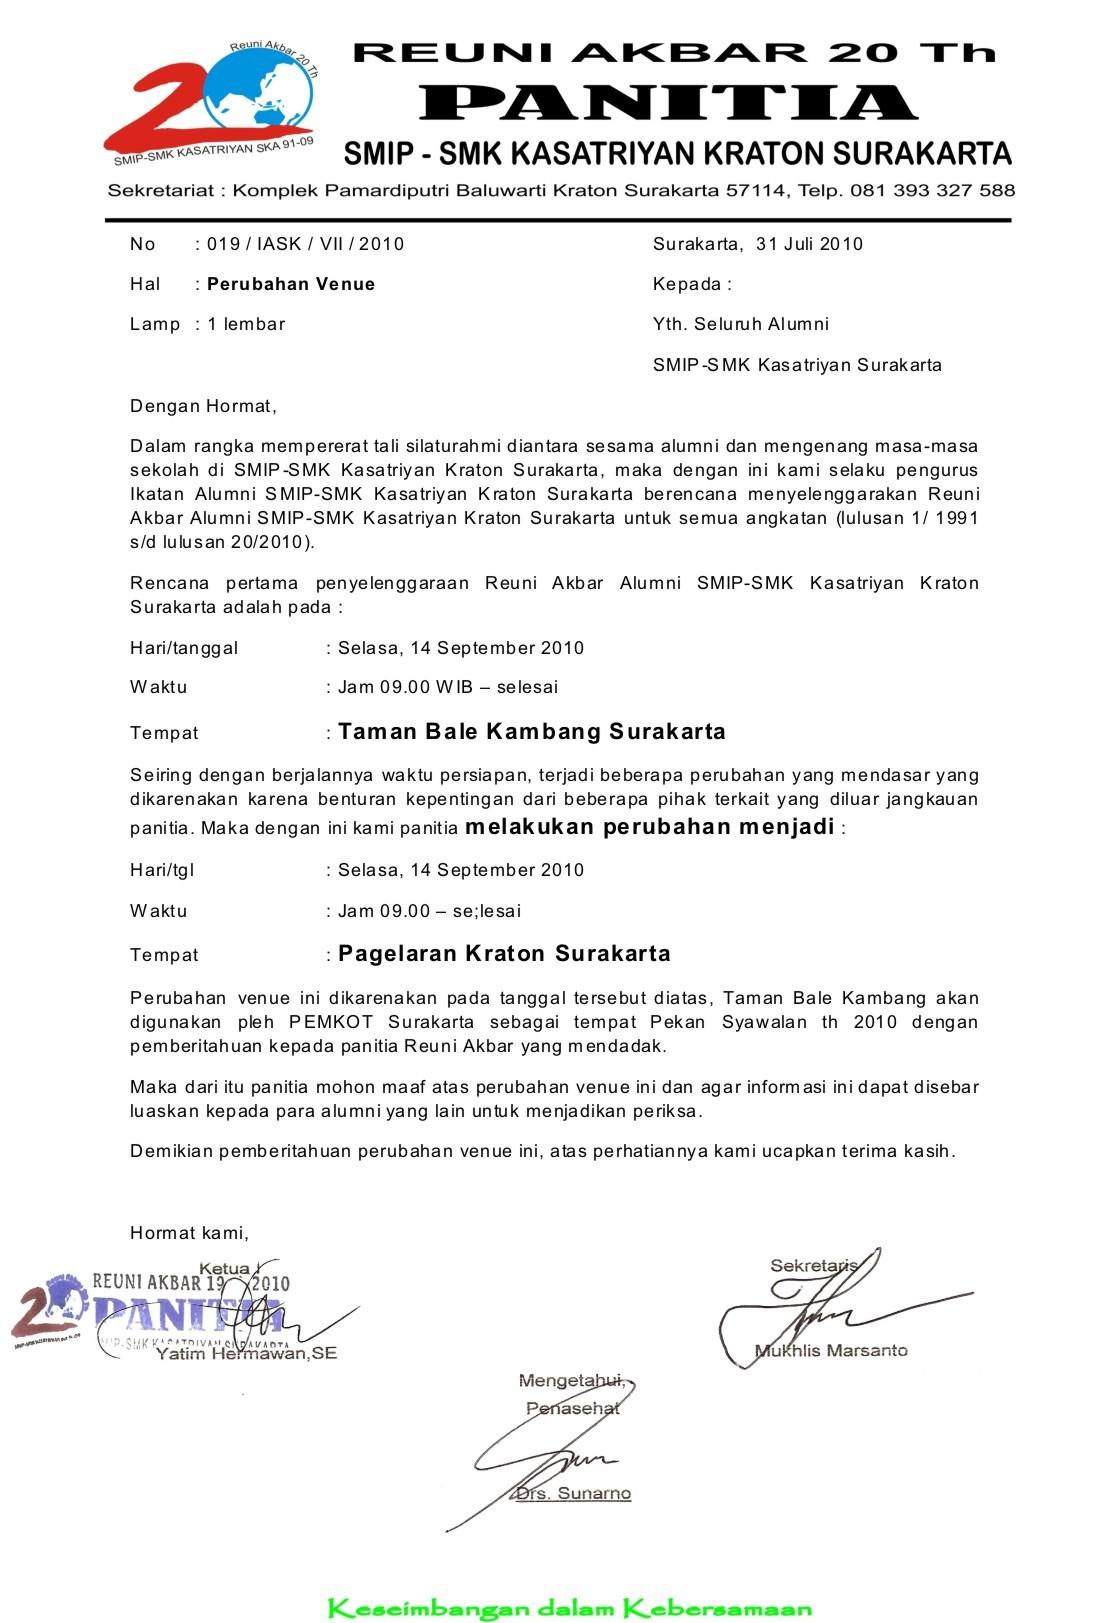 Nieniek Catatan Alumni Smip Kasatriyan Surakarta